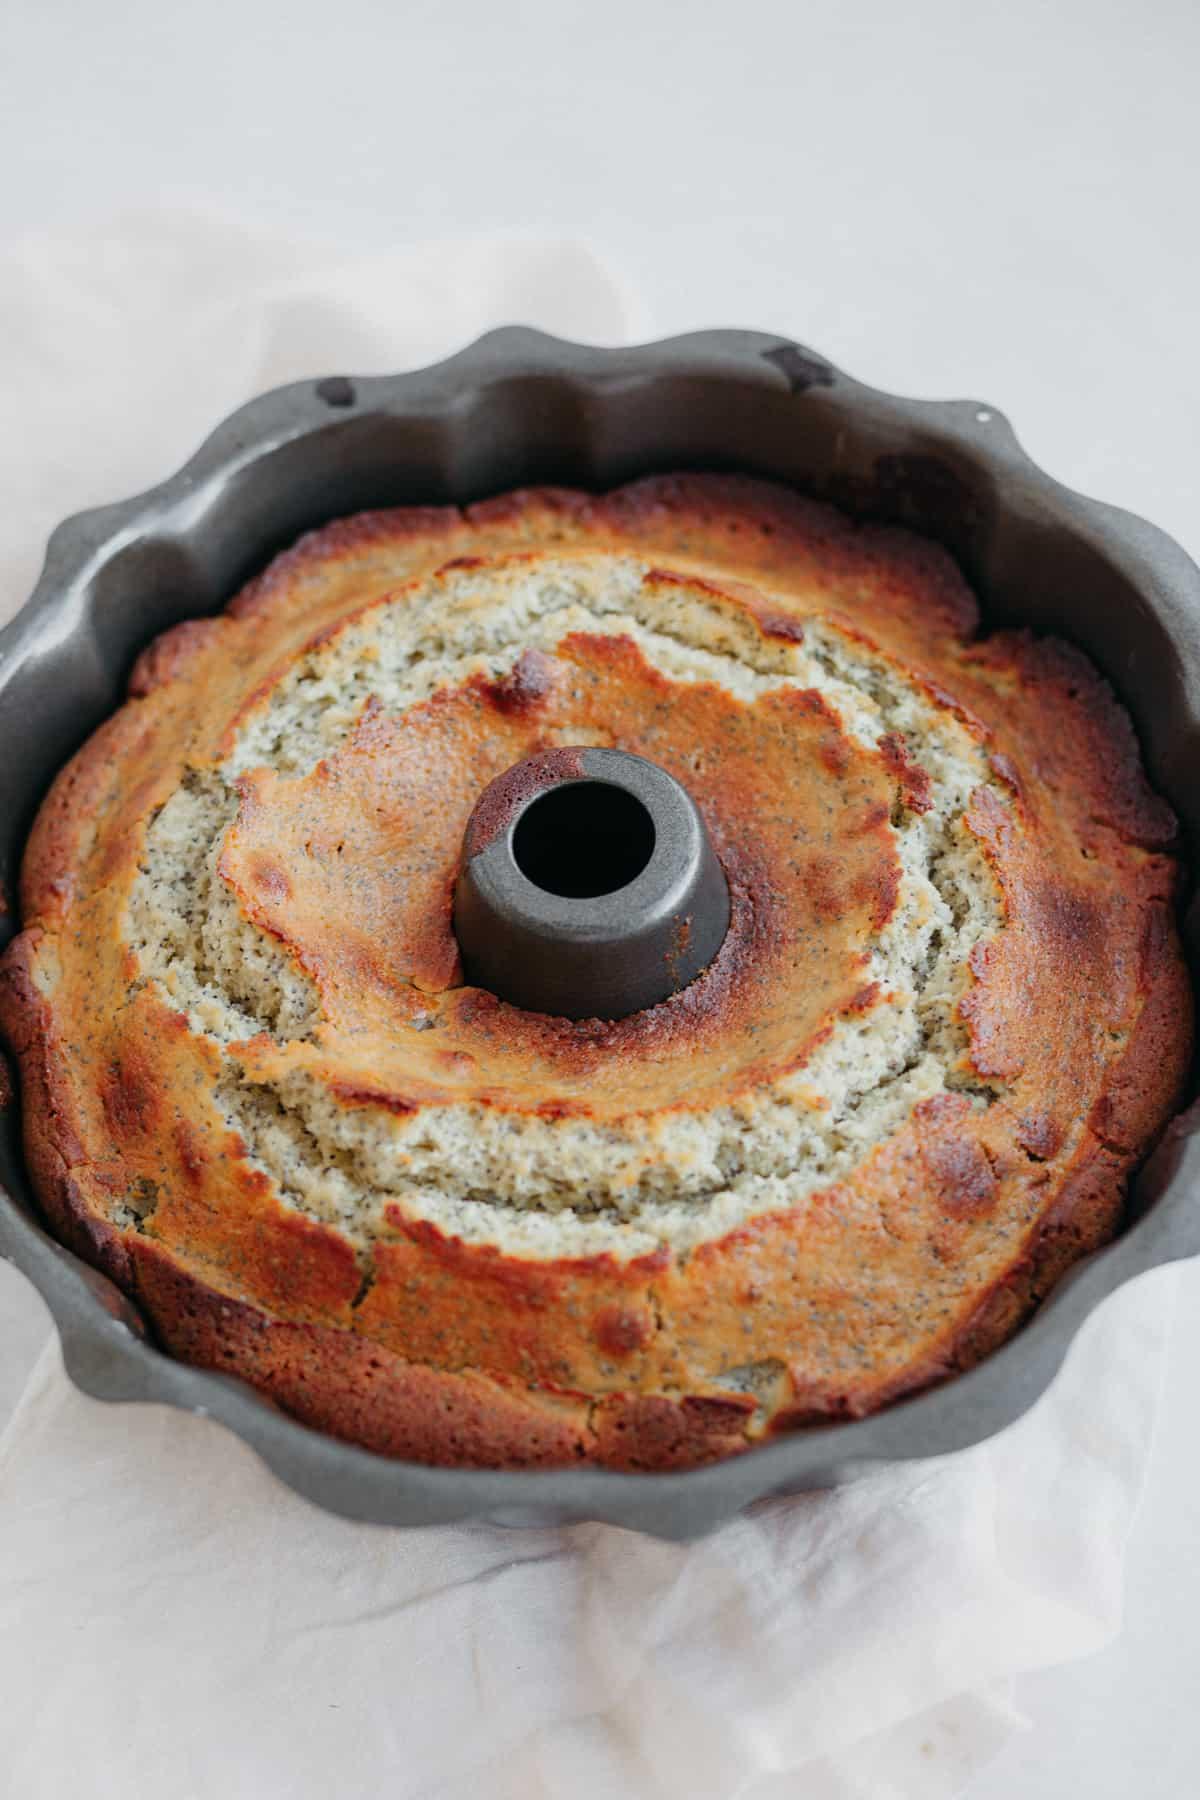 A bundt cake pan with a baked lemon seed cake